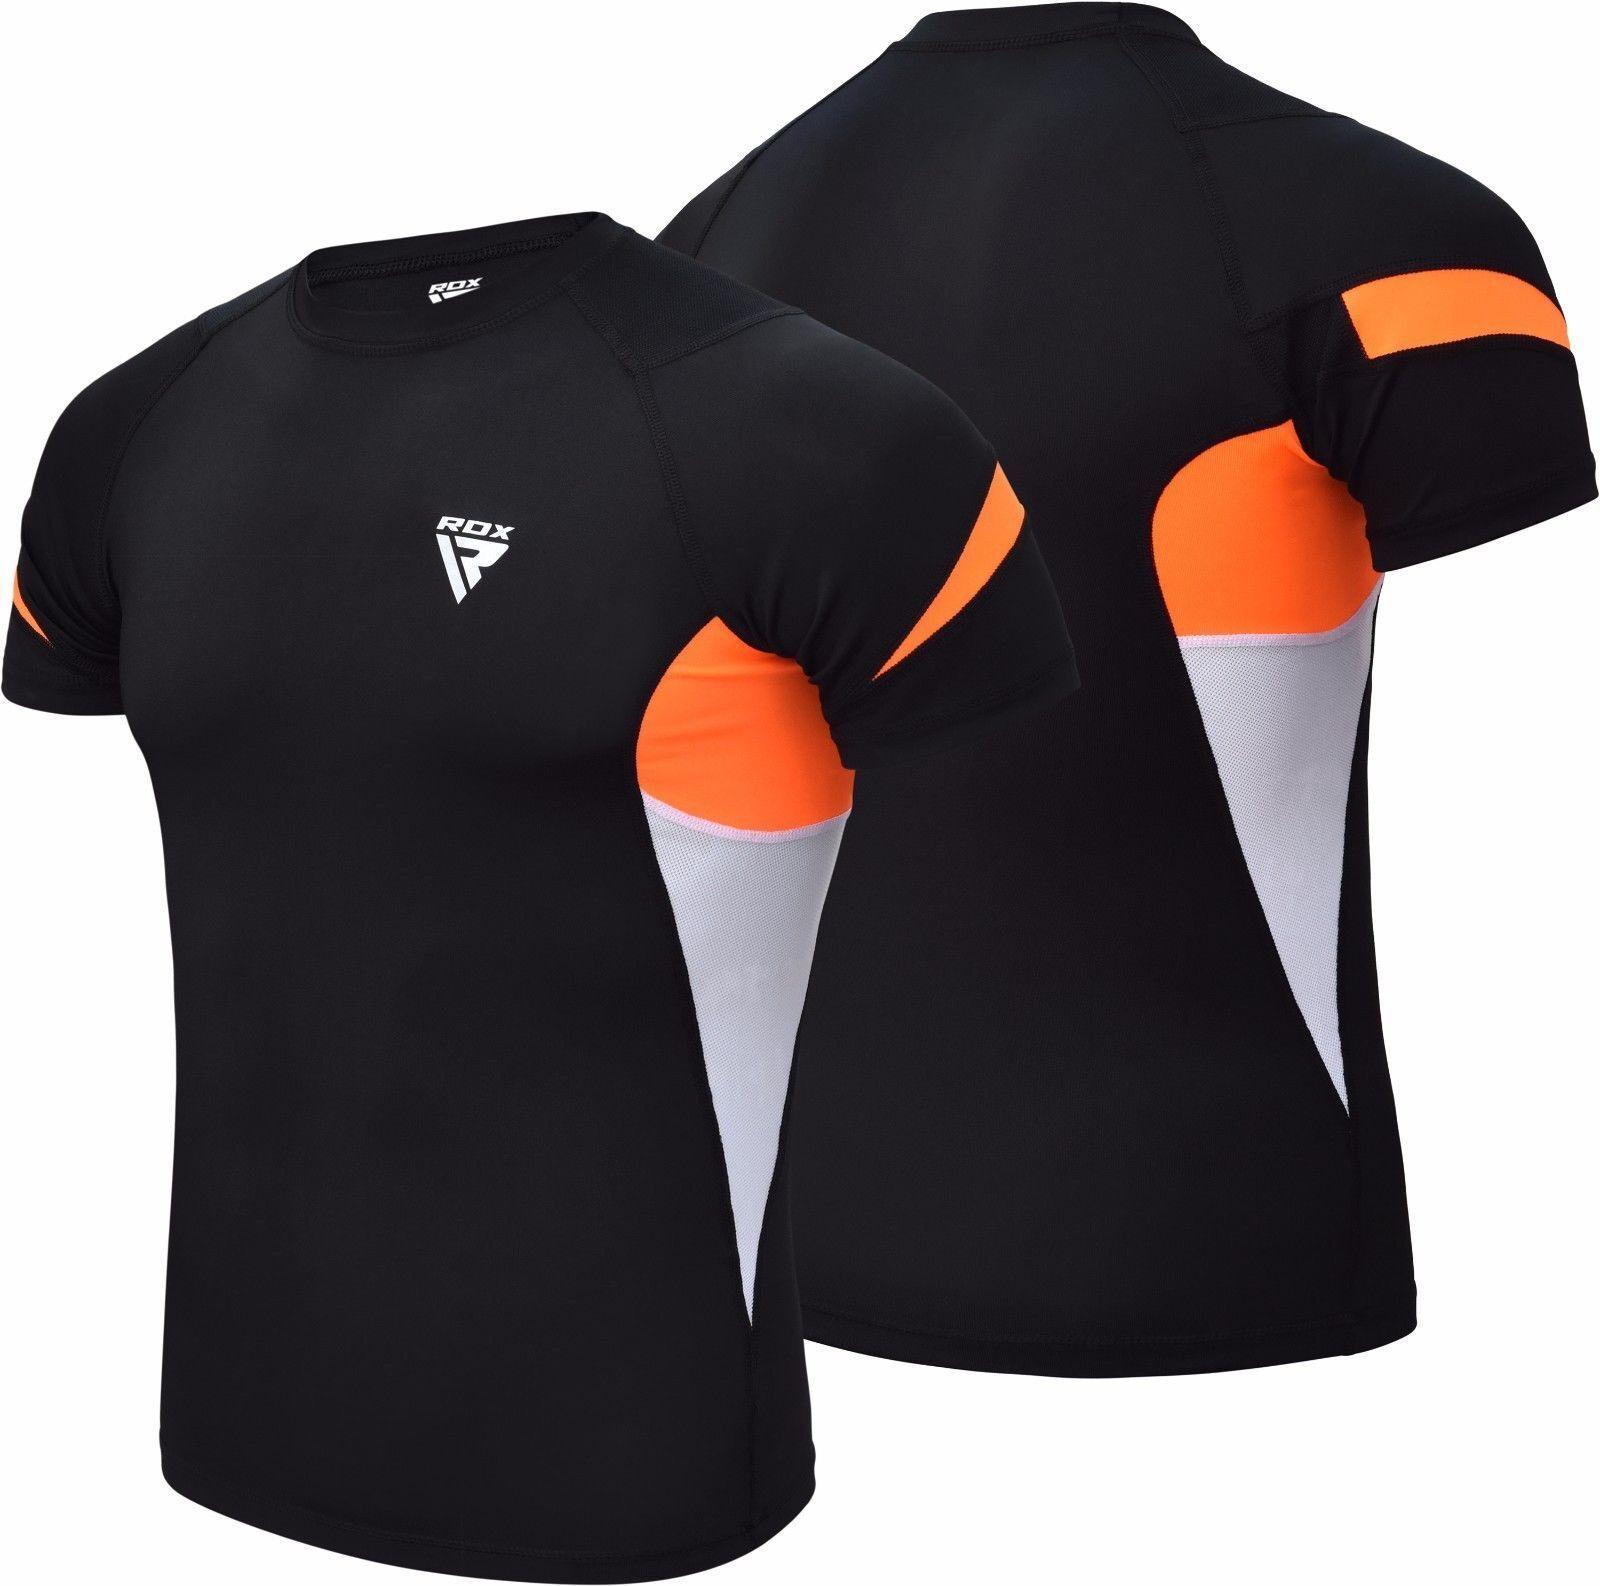 RDX Short Sleeve Rash Guard MMA BJJ Shirt Gym Training Swimming Compression US